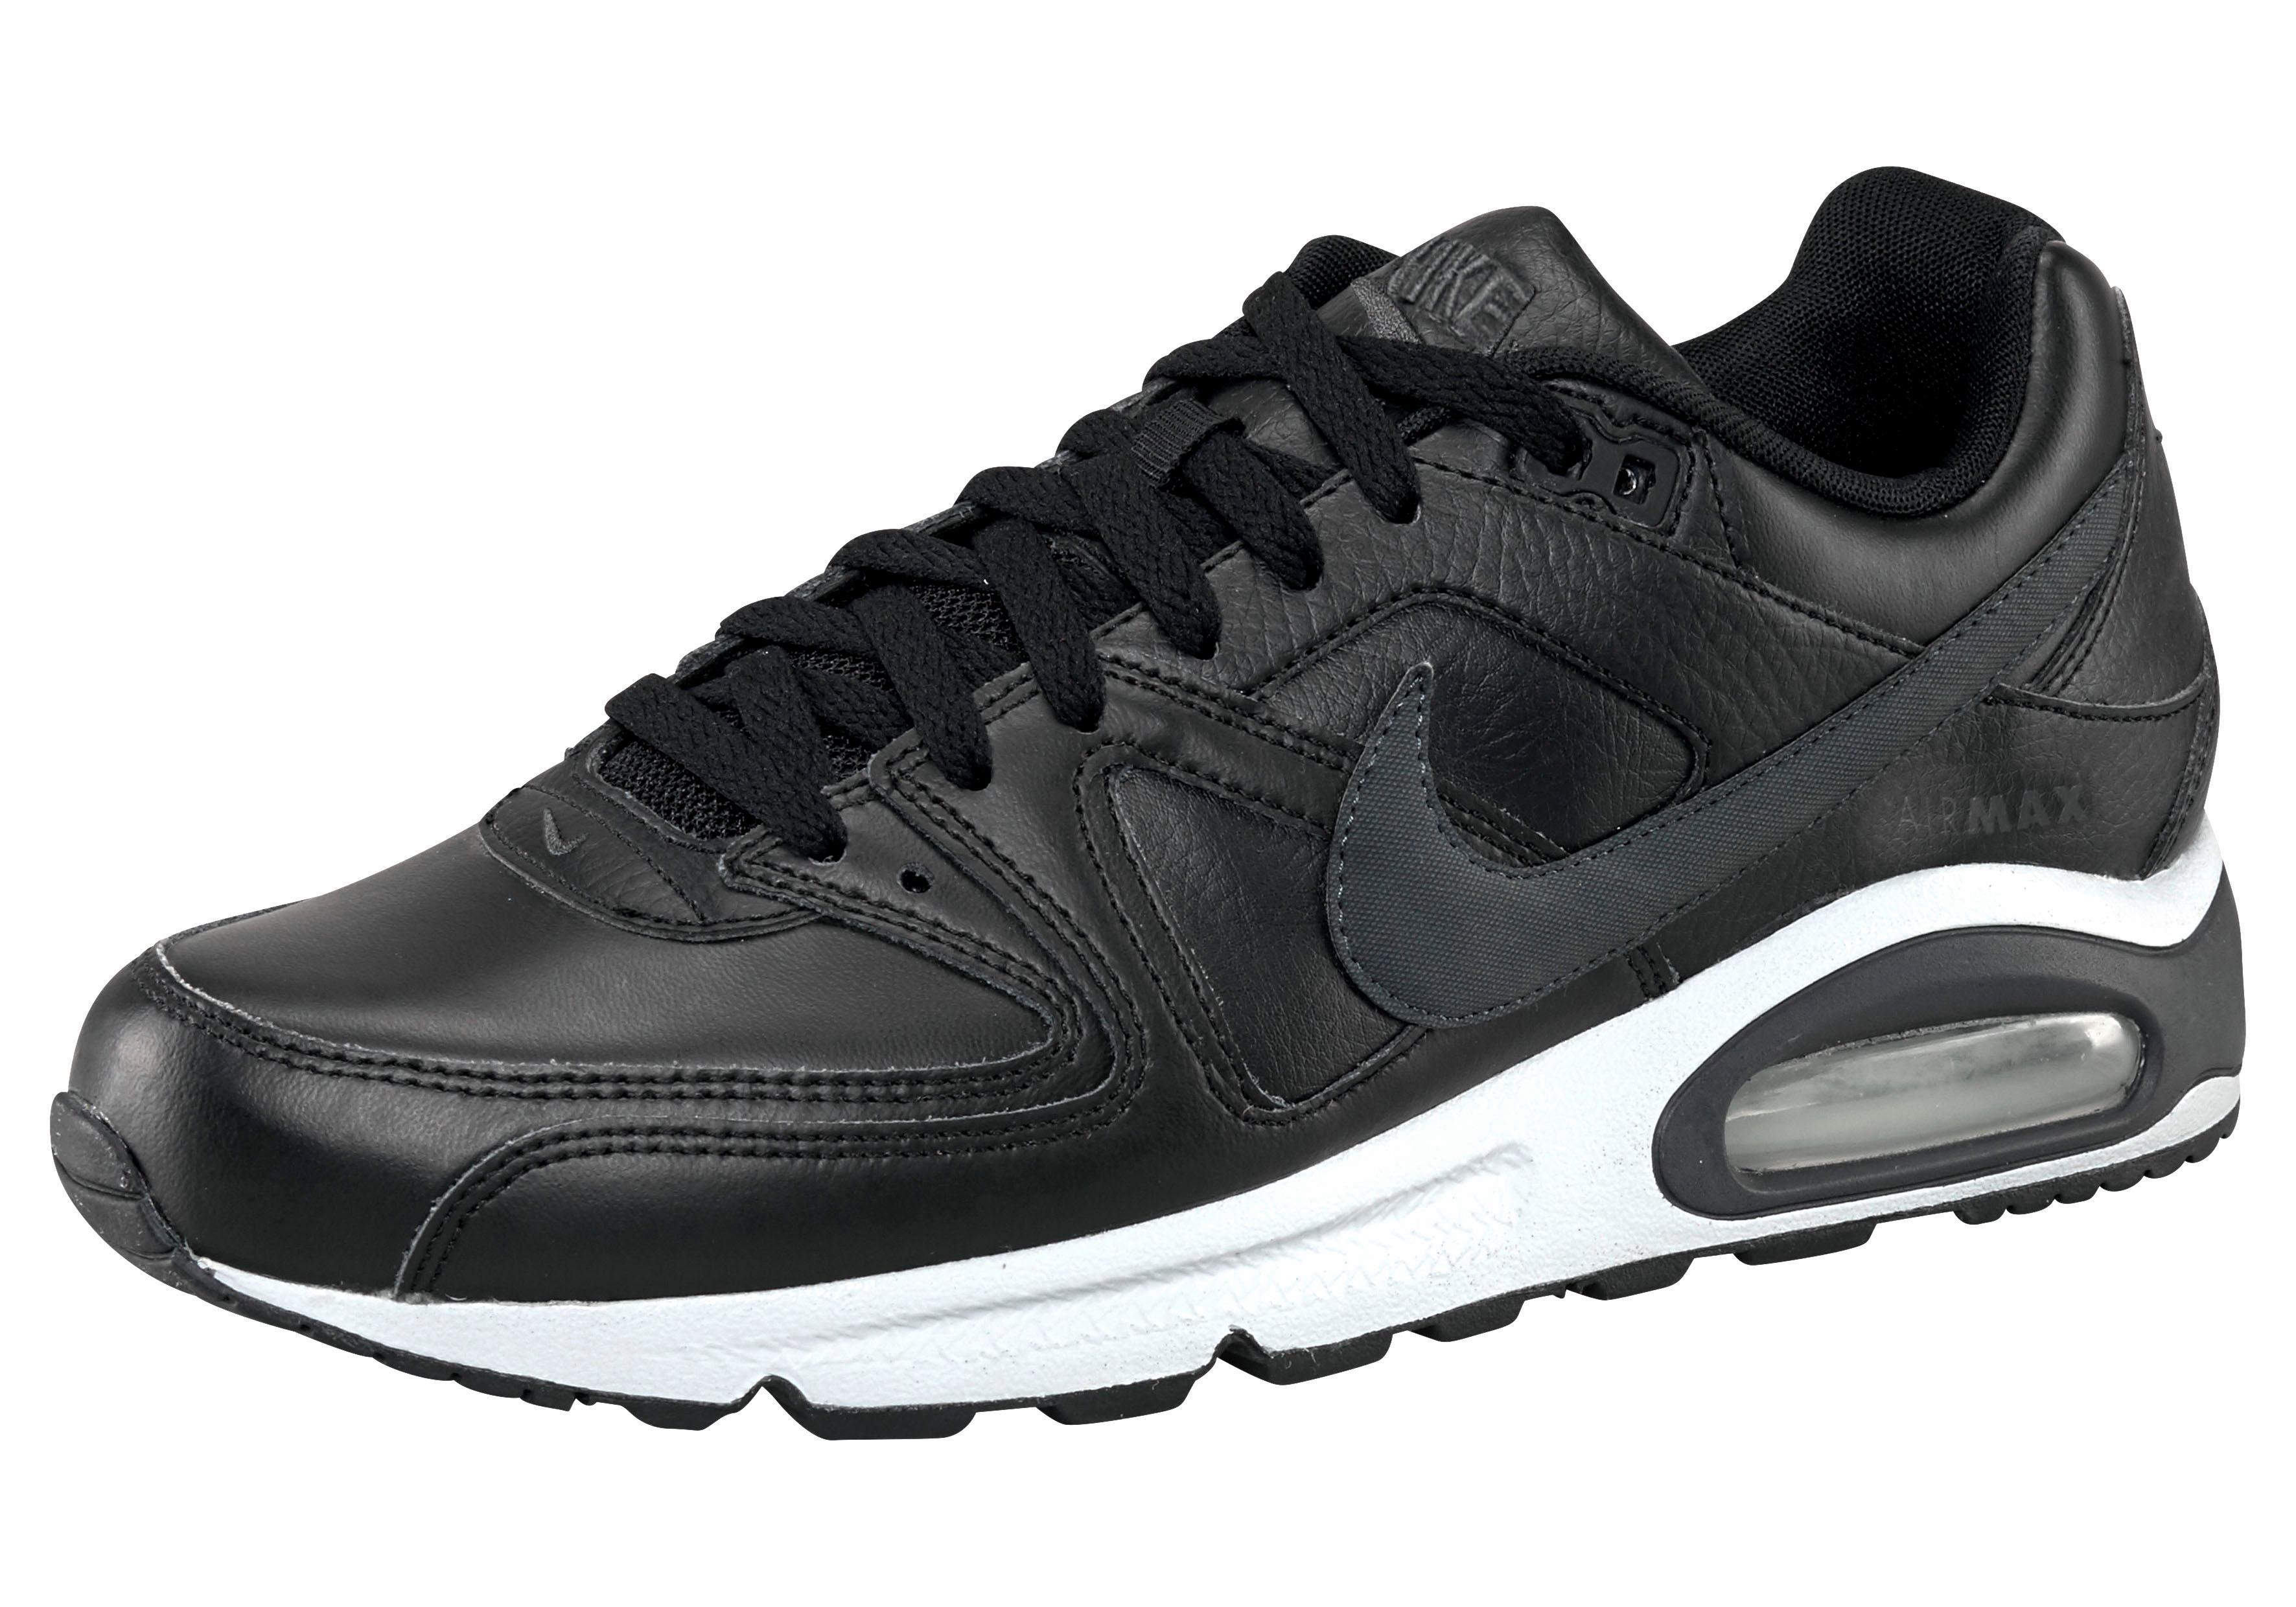 0bee8681e3c7 Nike Sportswear Sneaker »Air Max Command Leather« per Rechnung